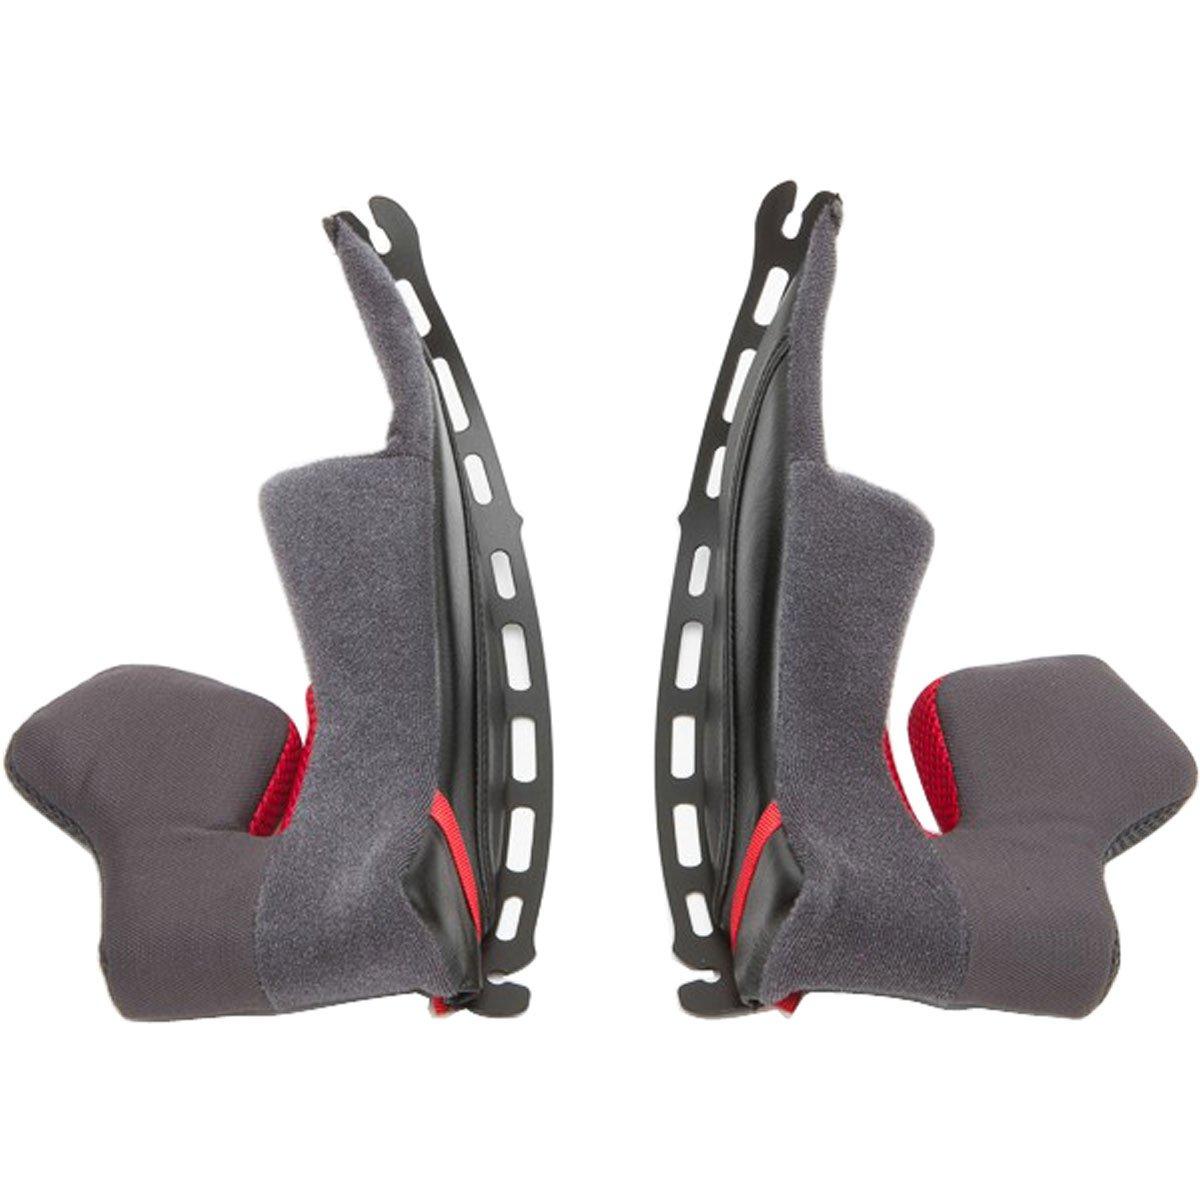 Shoei X-Fourteen Cheek Pad Set 35mm Street Motorcycle Helmet Accessories - Black/One Size